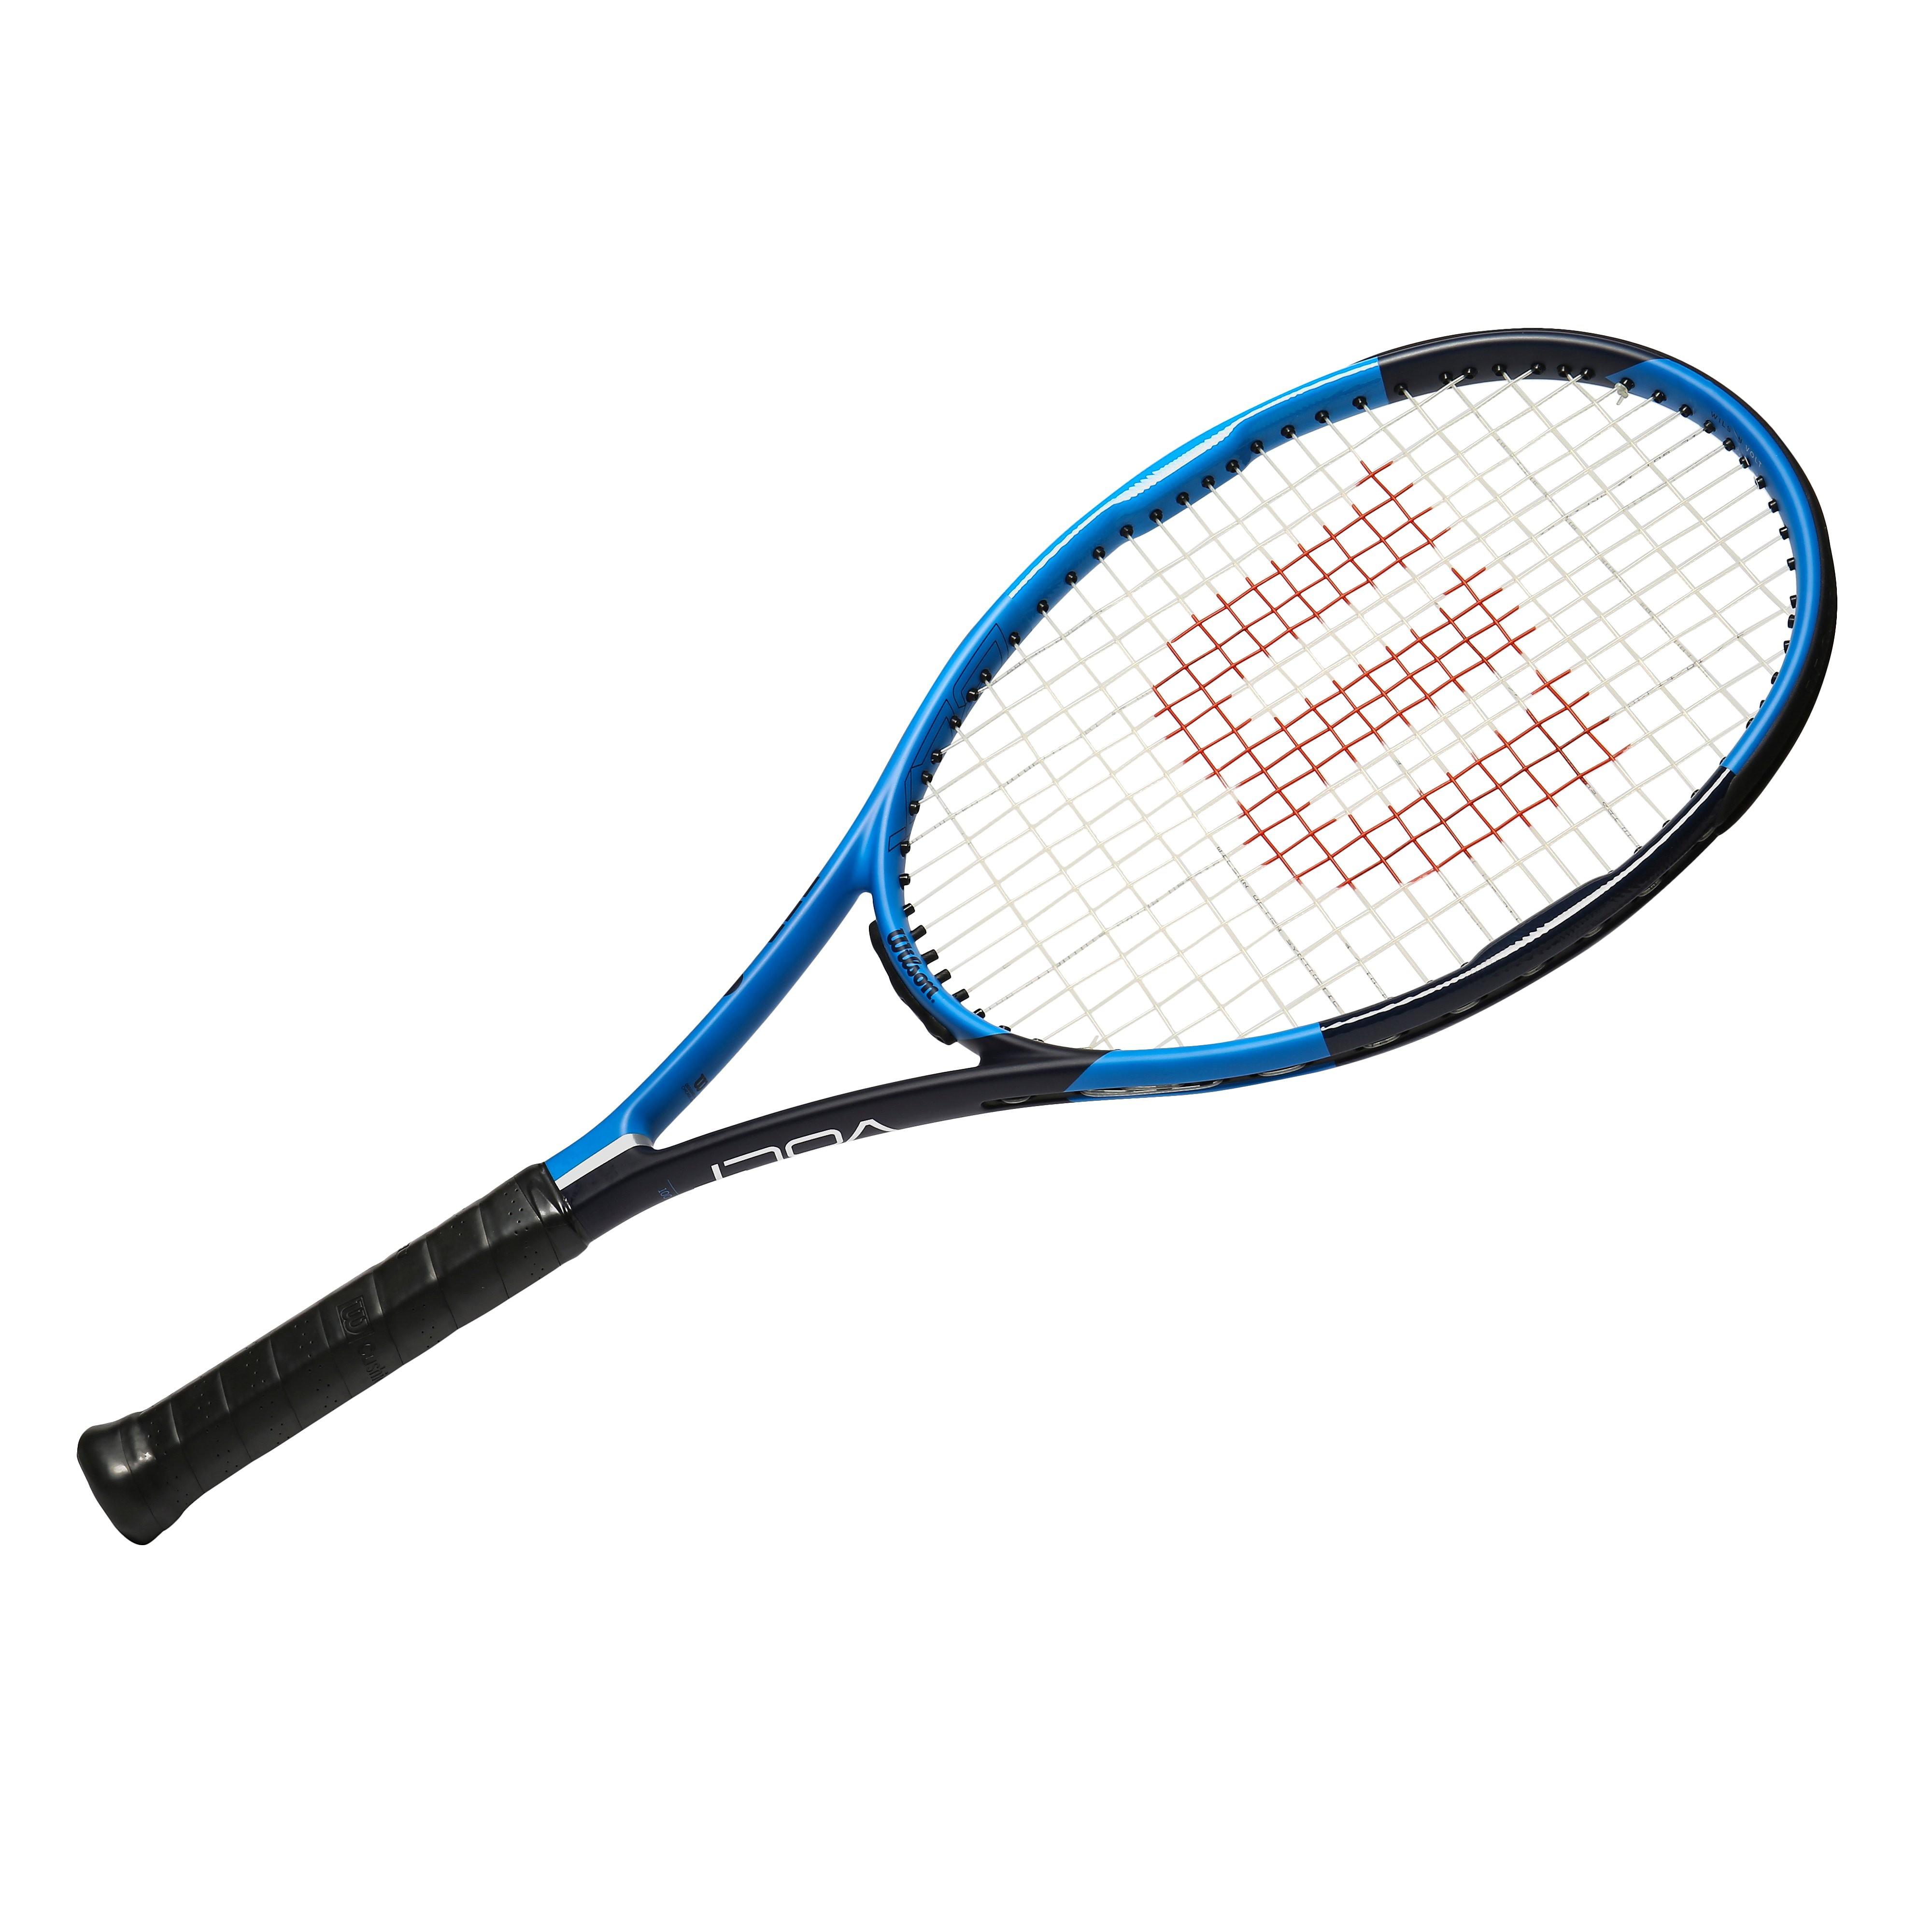 Mens Black Wilson BLX Volt Tennis Racket